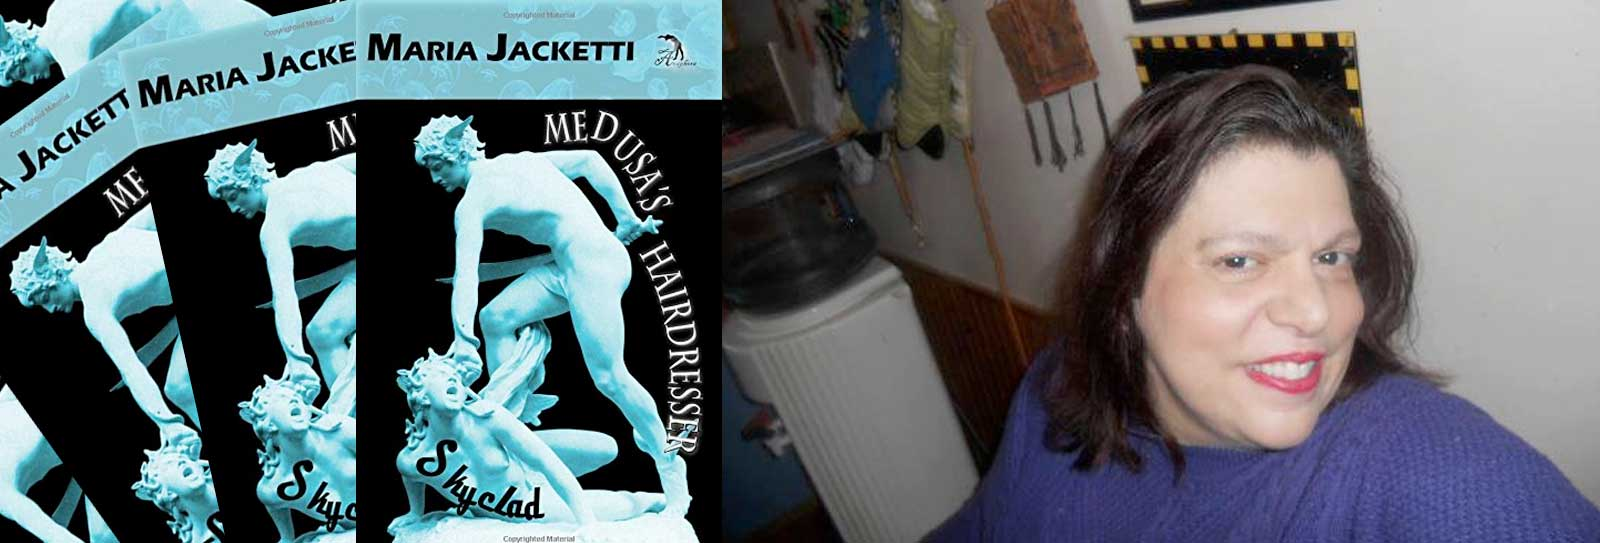 Maria Jacketti - Medusa's Hairdresser: Skyclad